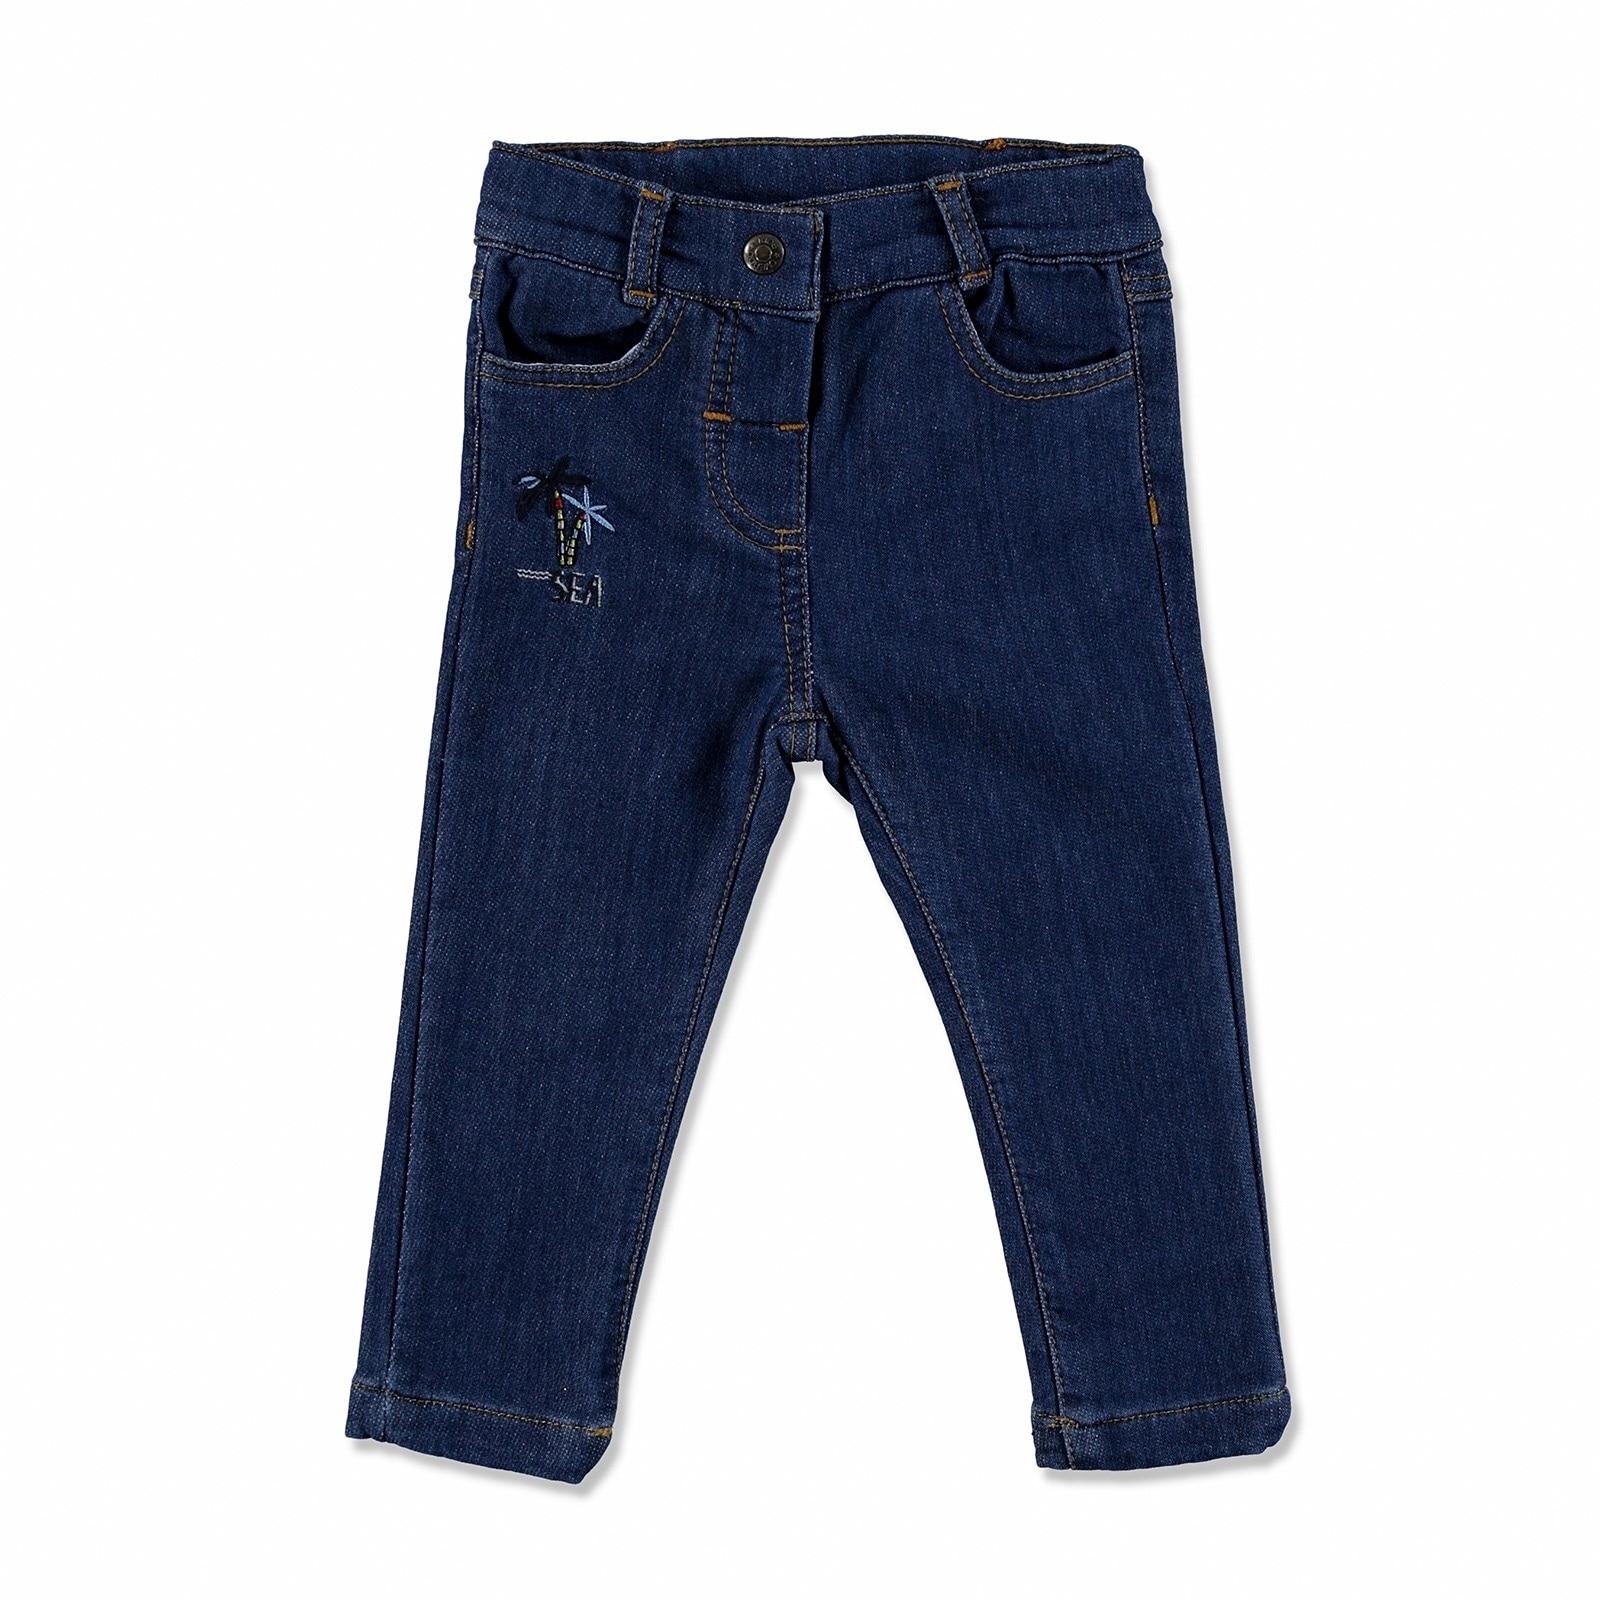 Ebebek Overdo Embroidered Cotton Baby Pants